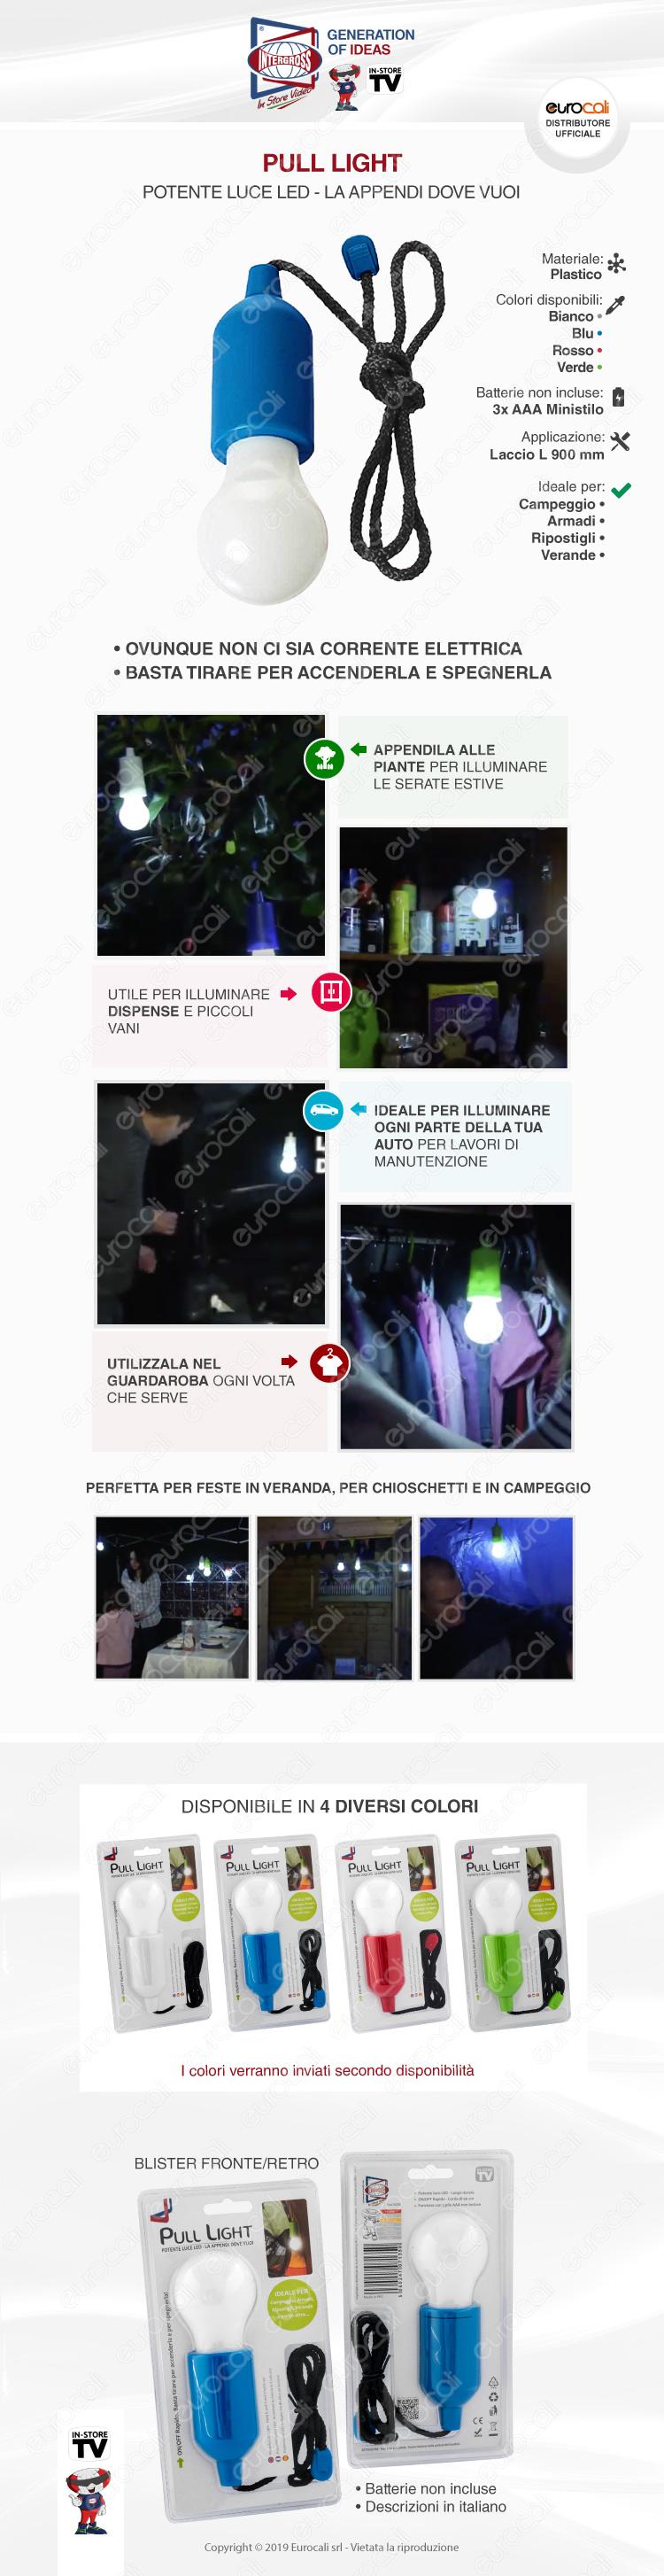 Intergross Pull Light Lampadina LED Senza Fili a Batteria da Appendere